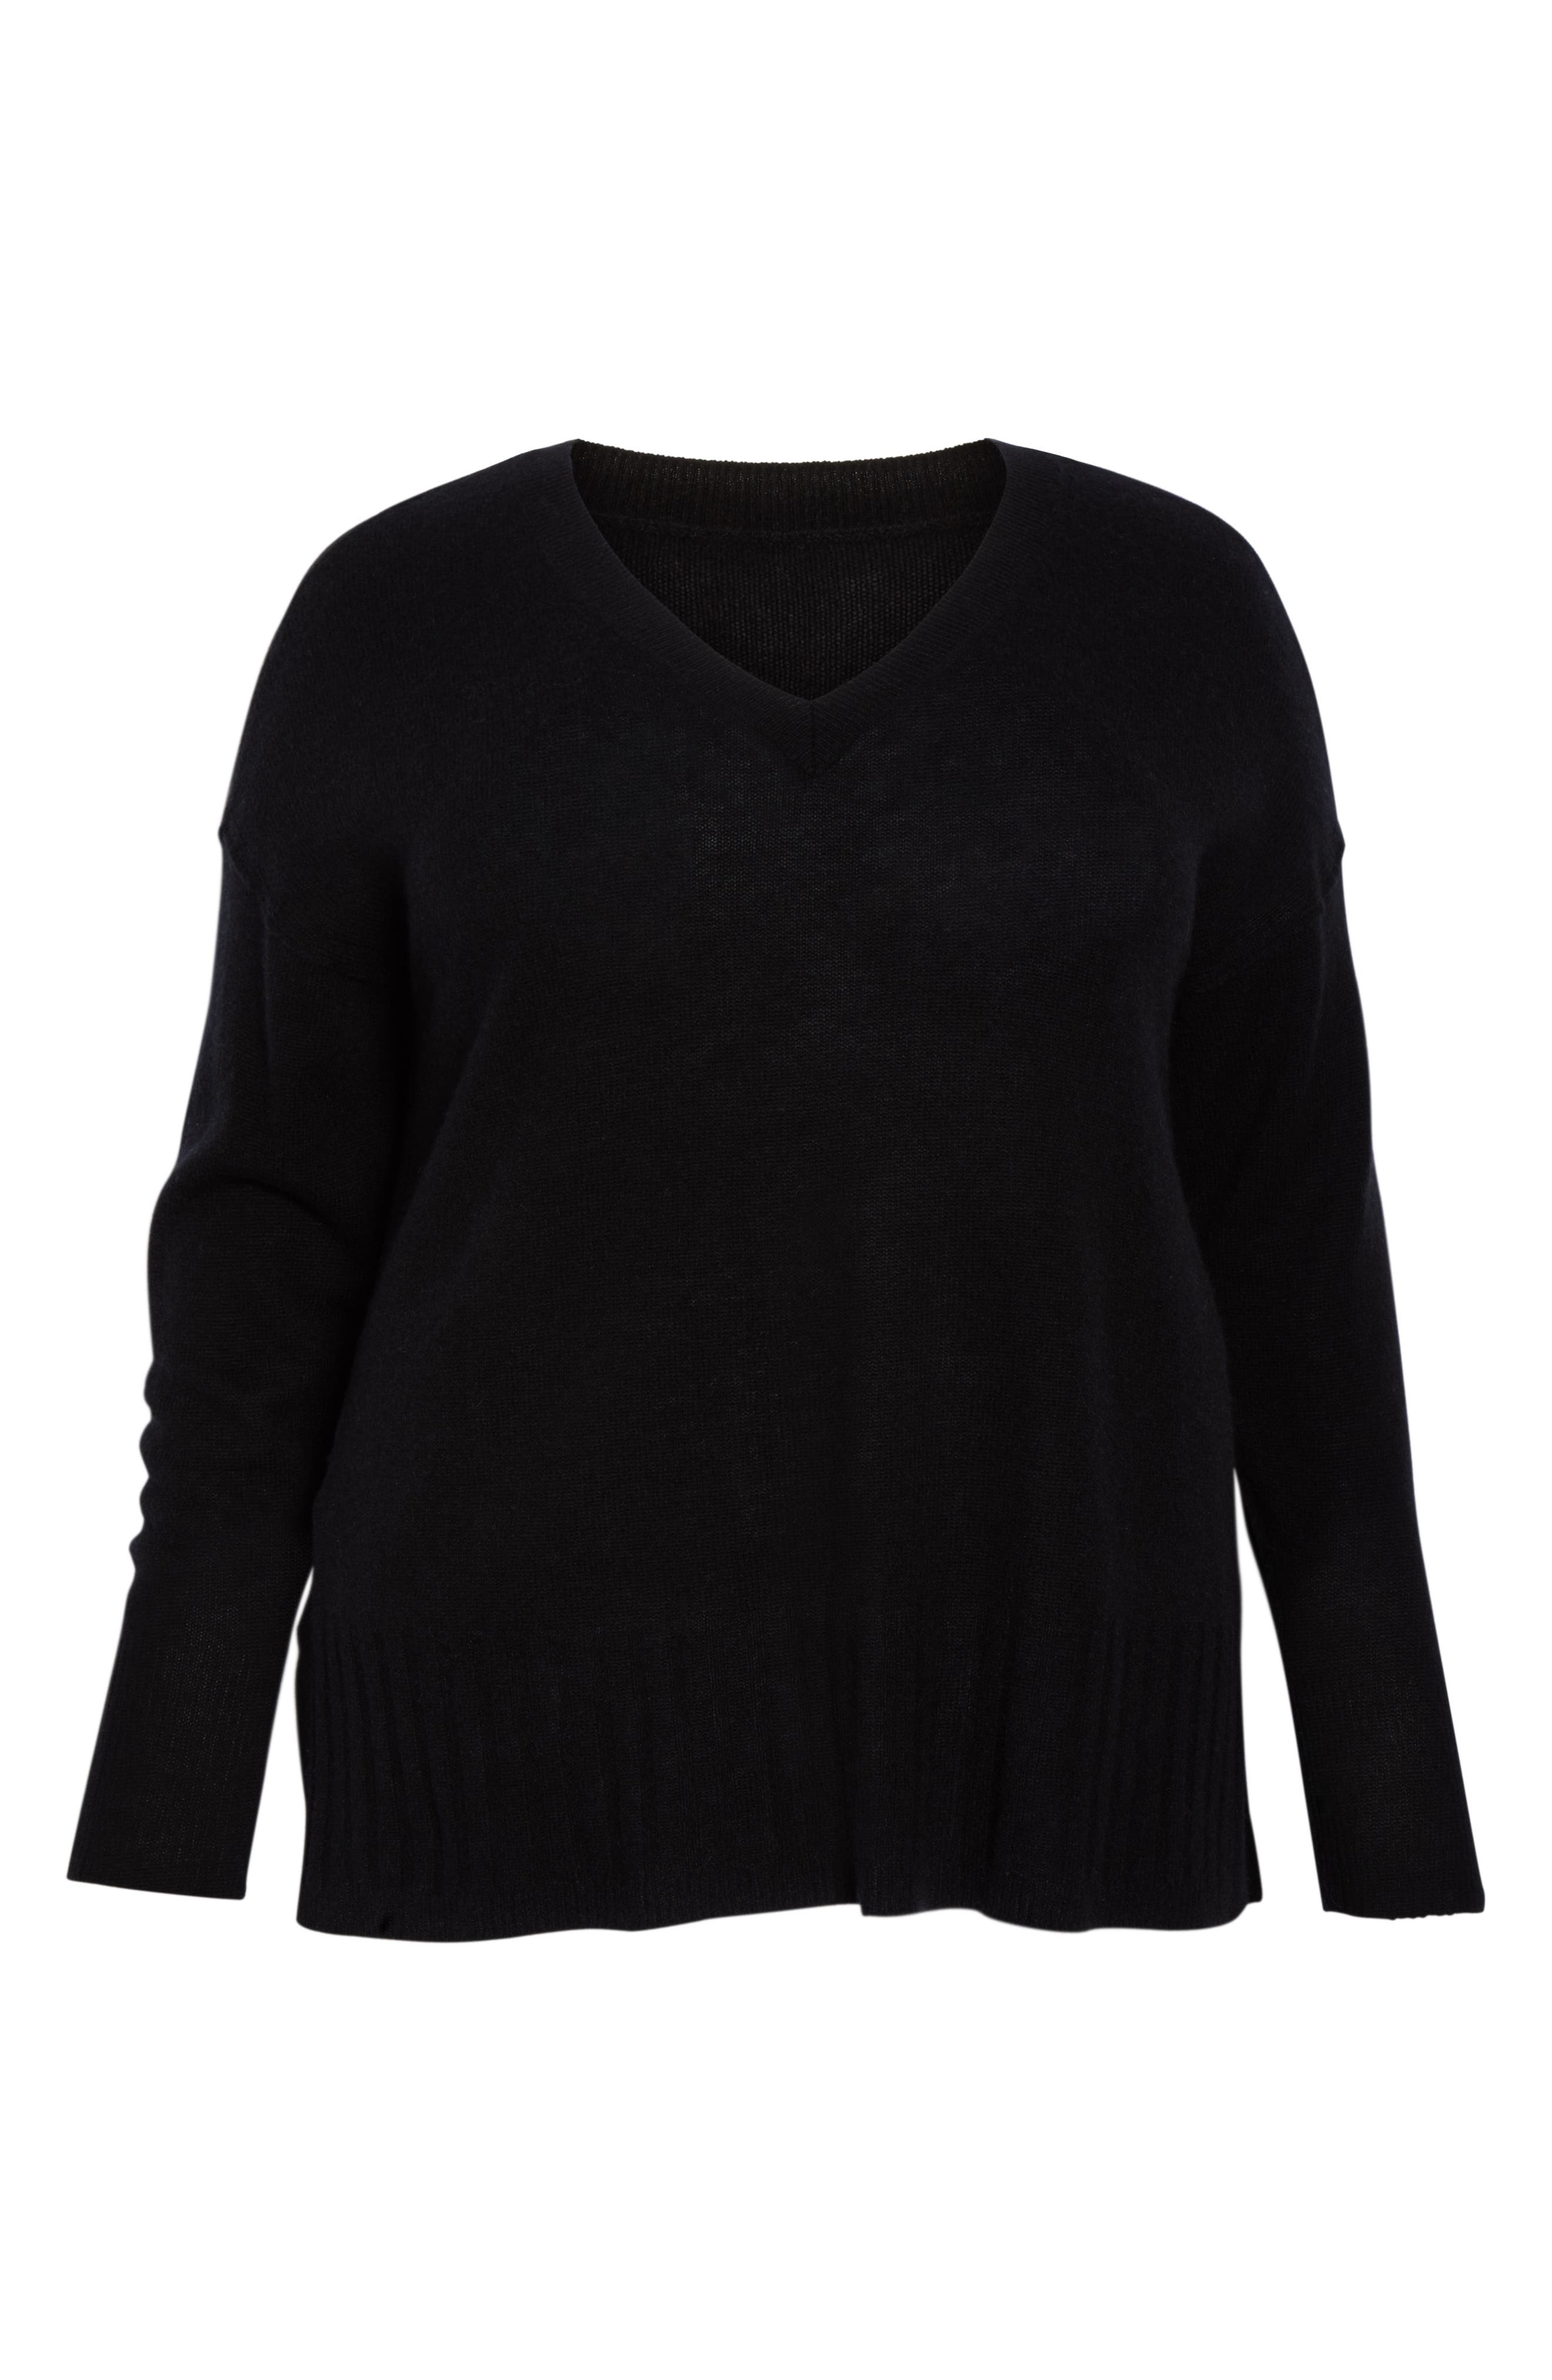 Wool & Cashmere Side Split Pullover,                             Alternate thumbnail 6, color,                             BLACK